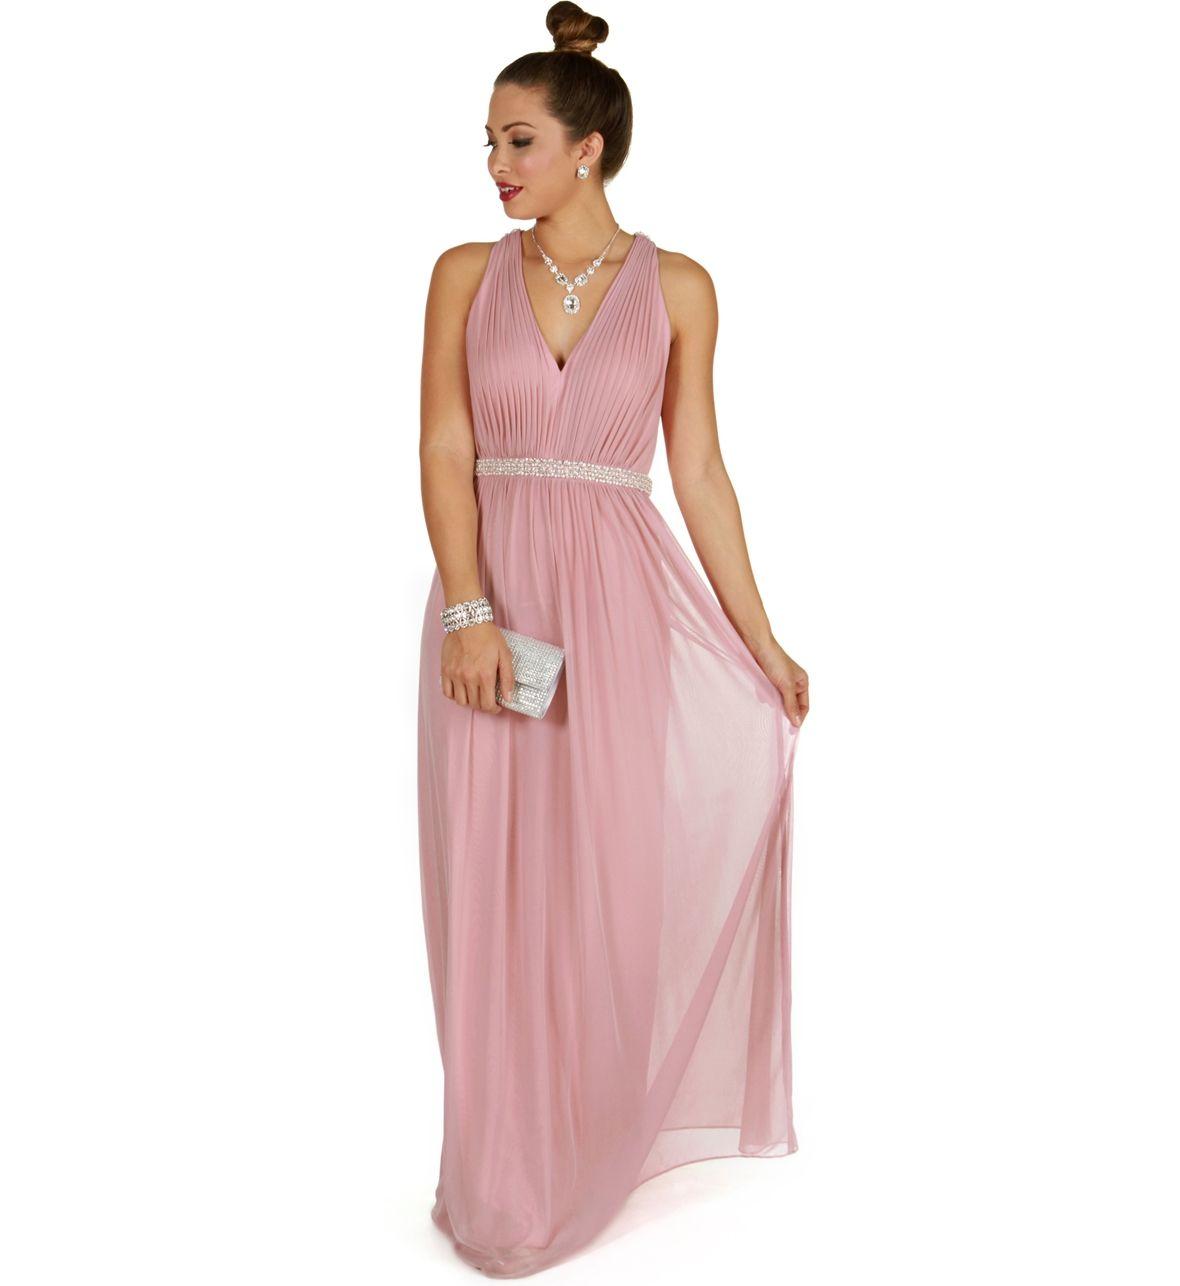 Svetlana-Blush Prom Dress at WindsorStore   Prom Dresses   Pinterest ...